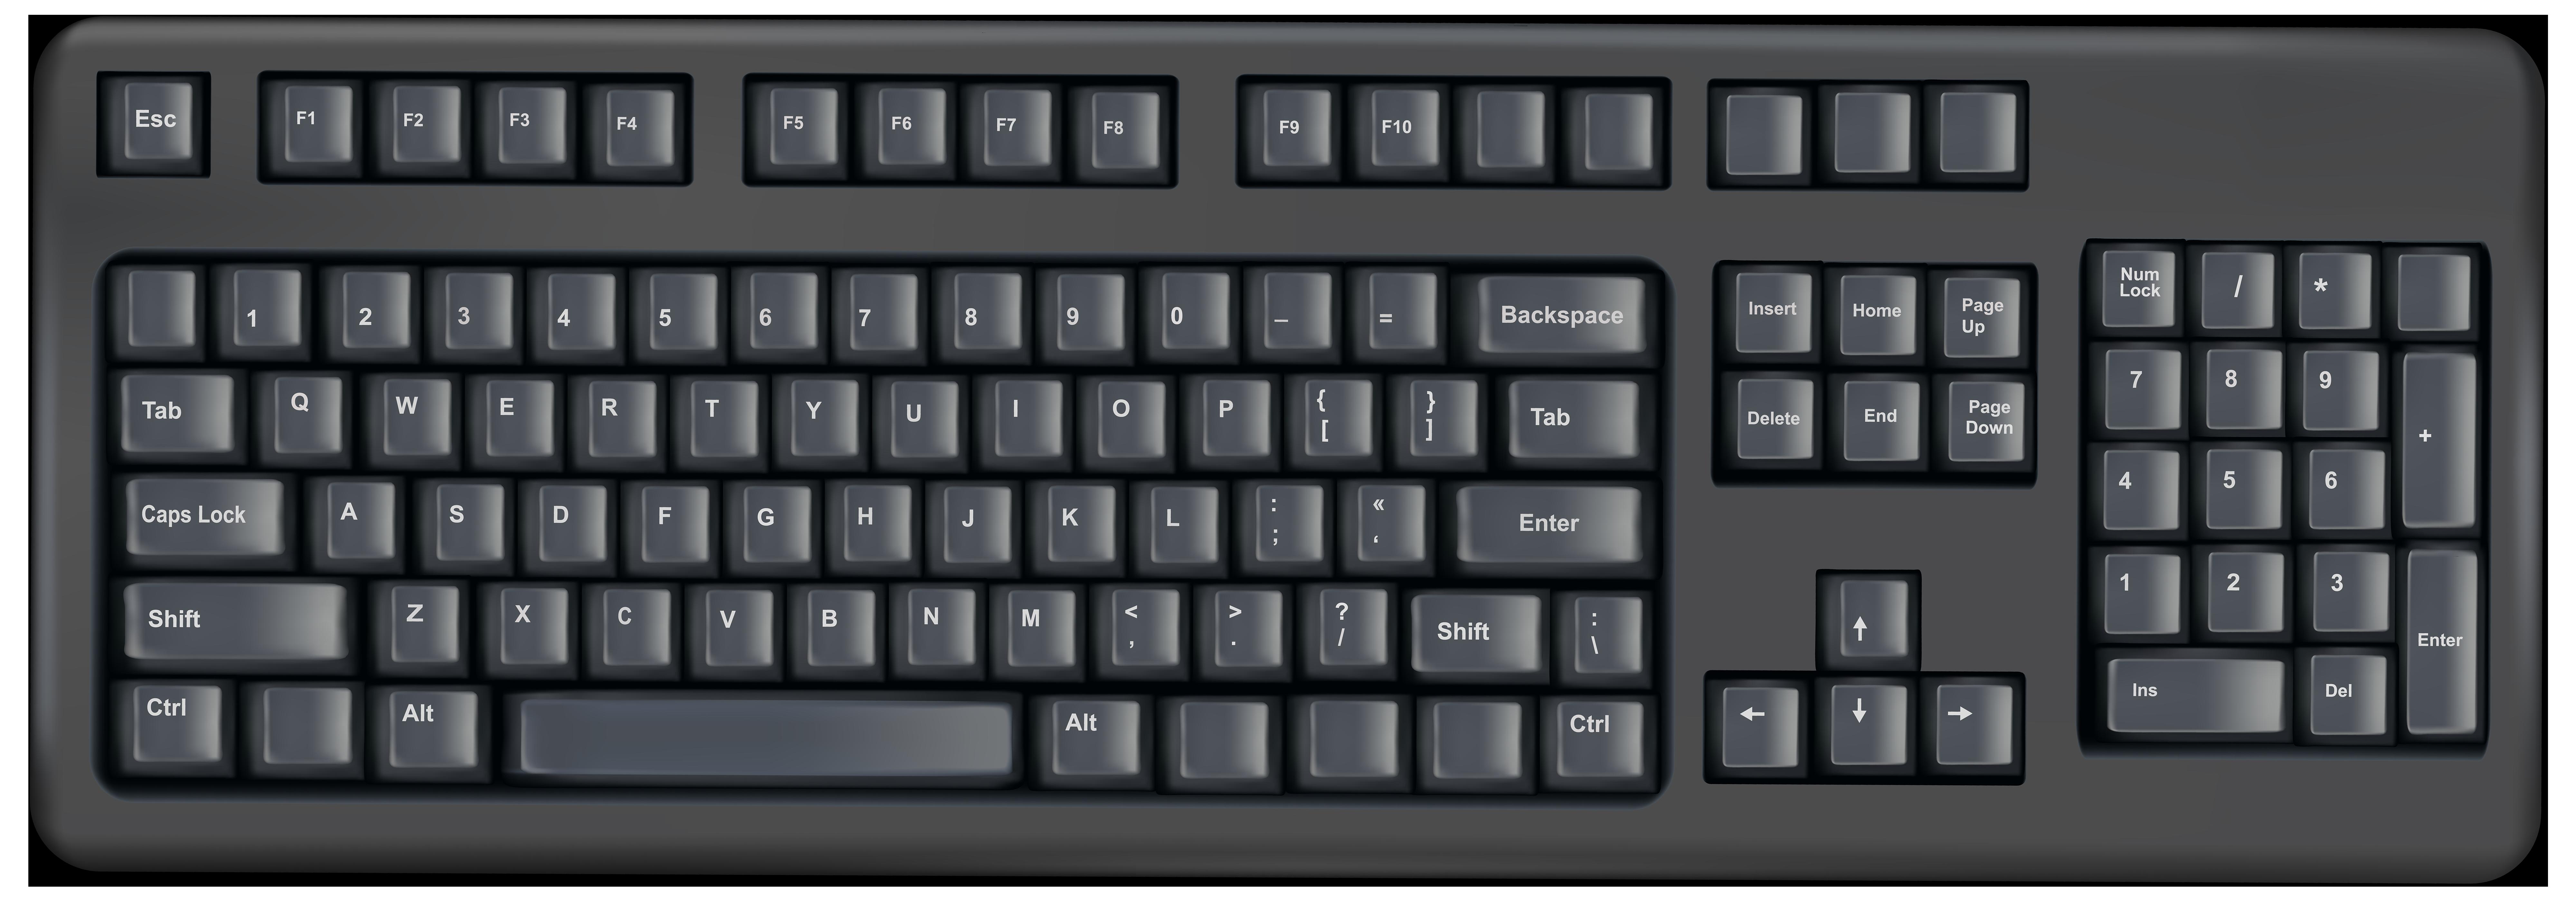 Keyboard clipart transparent background, Keyboard ...